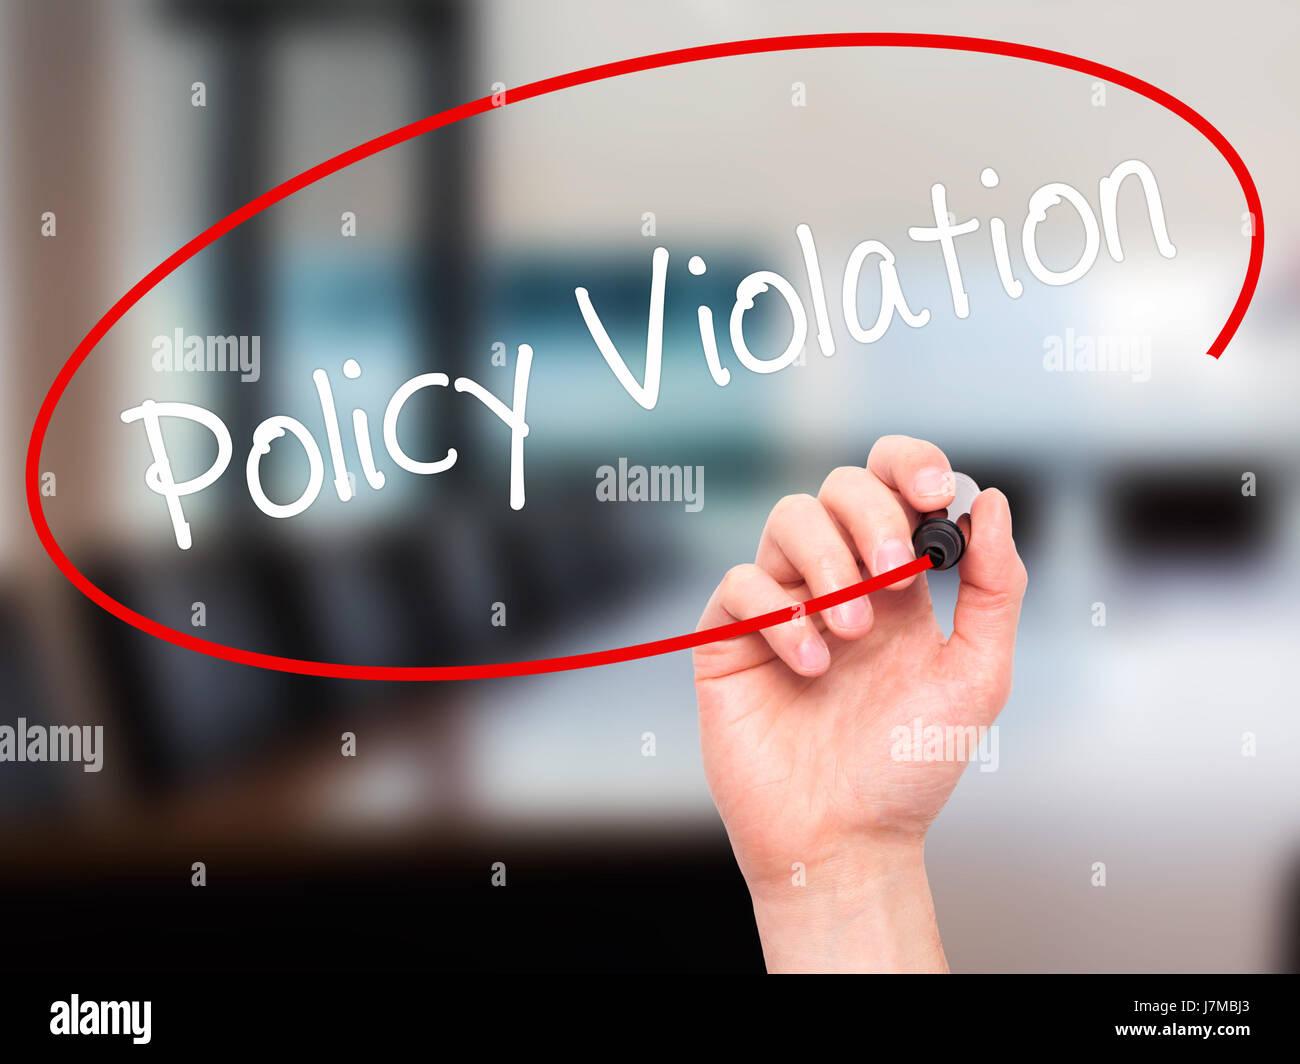 policy violation